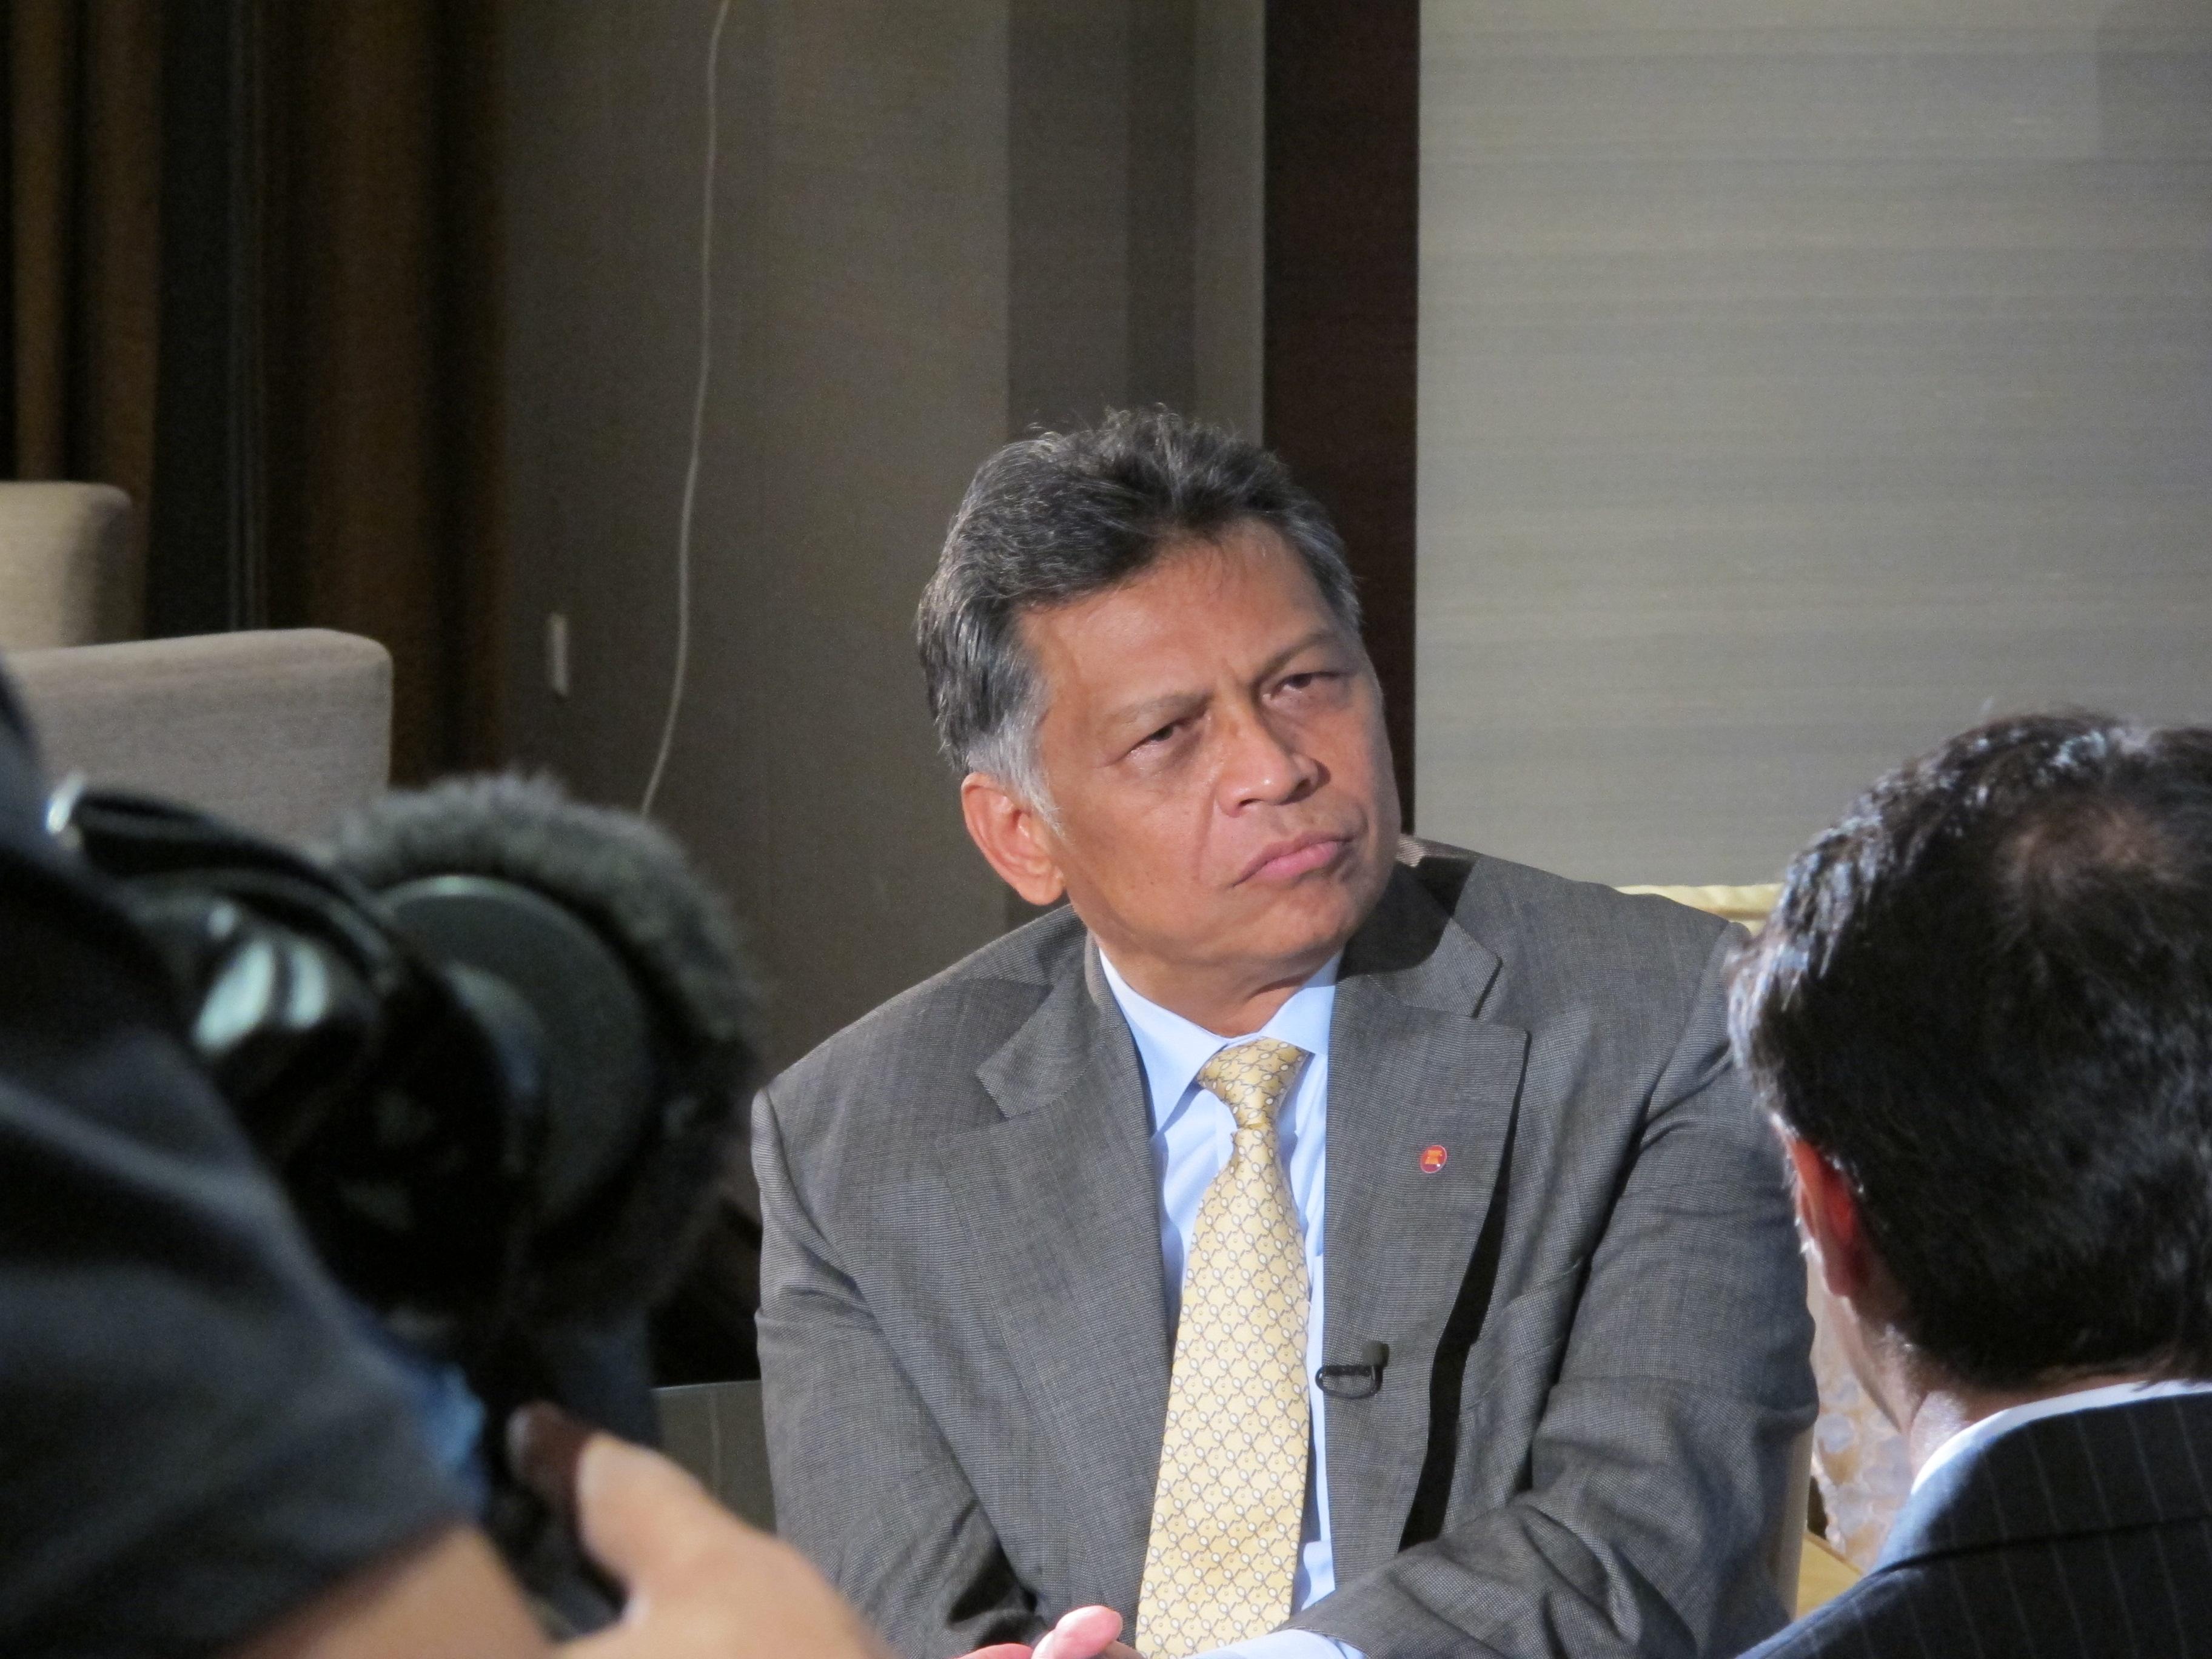 Dr. Surin Al Jazeera Interview 3